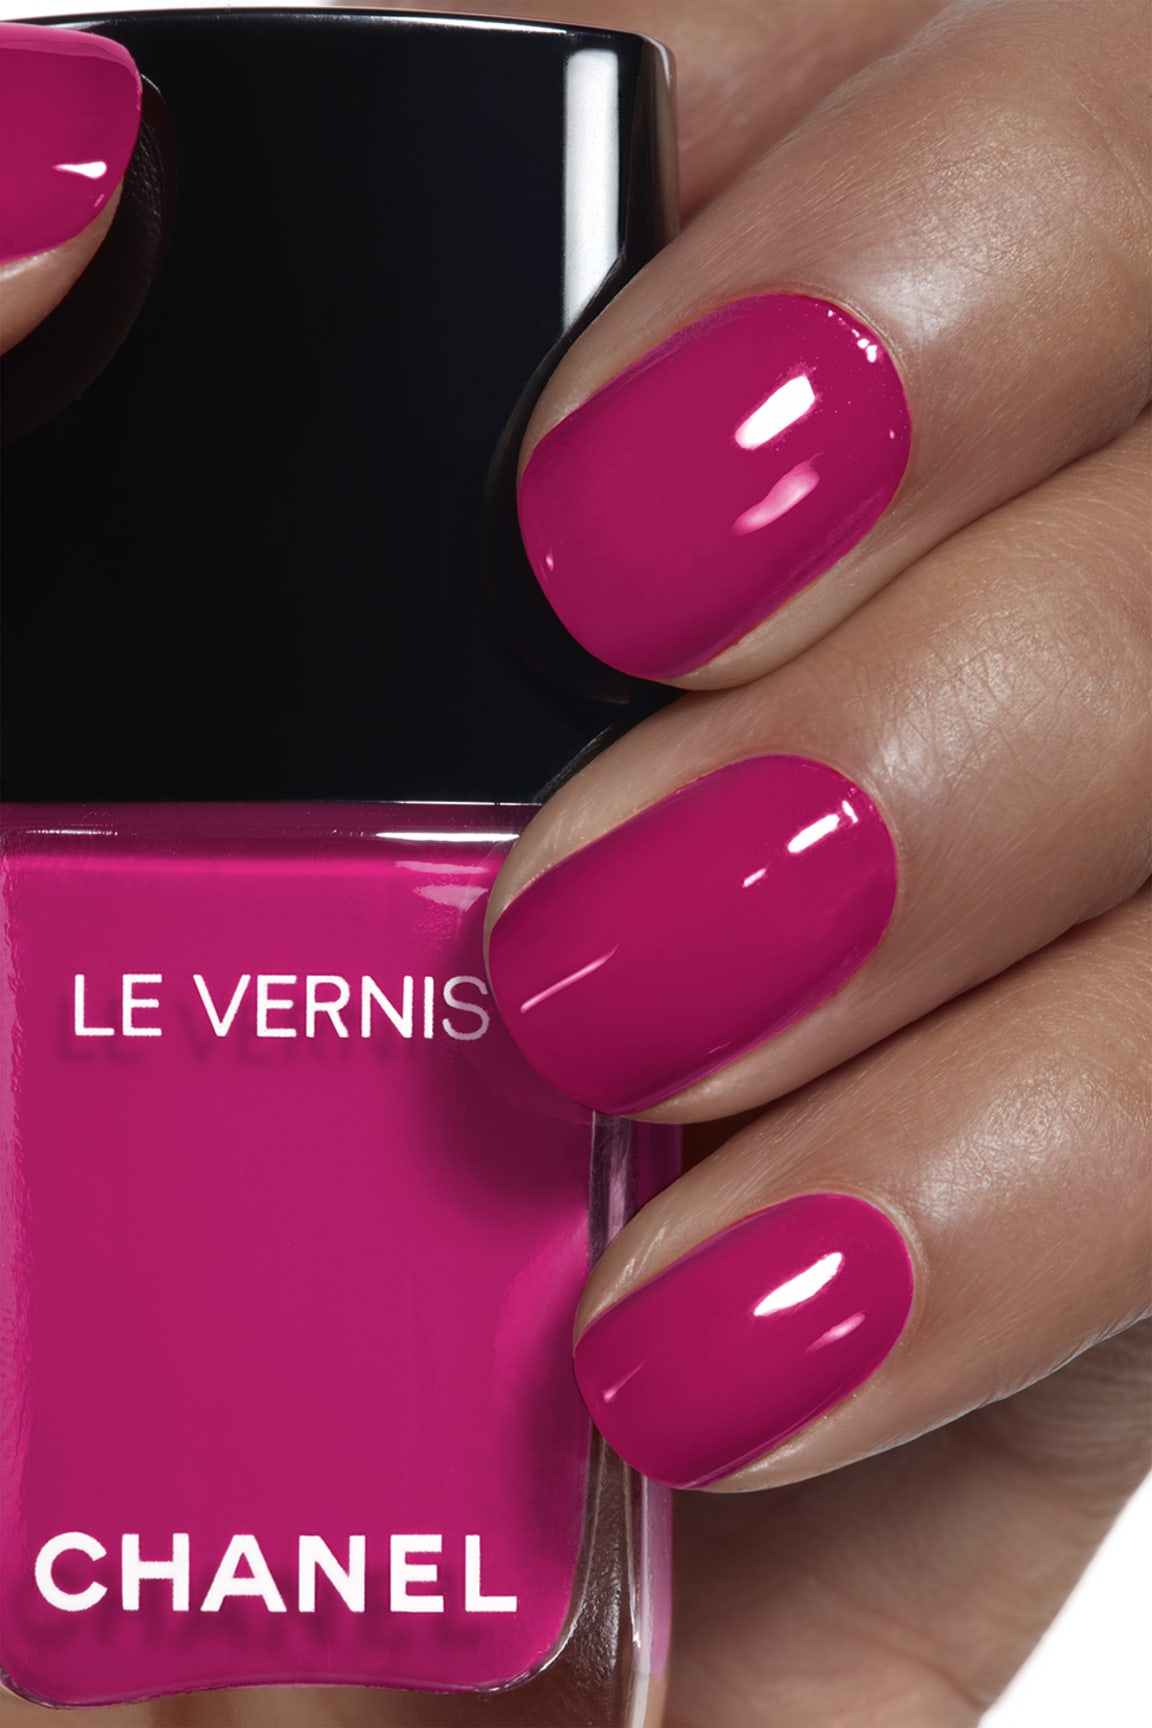 Application makeup visual 1 - LE VERNIS 759 - ENERGY